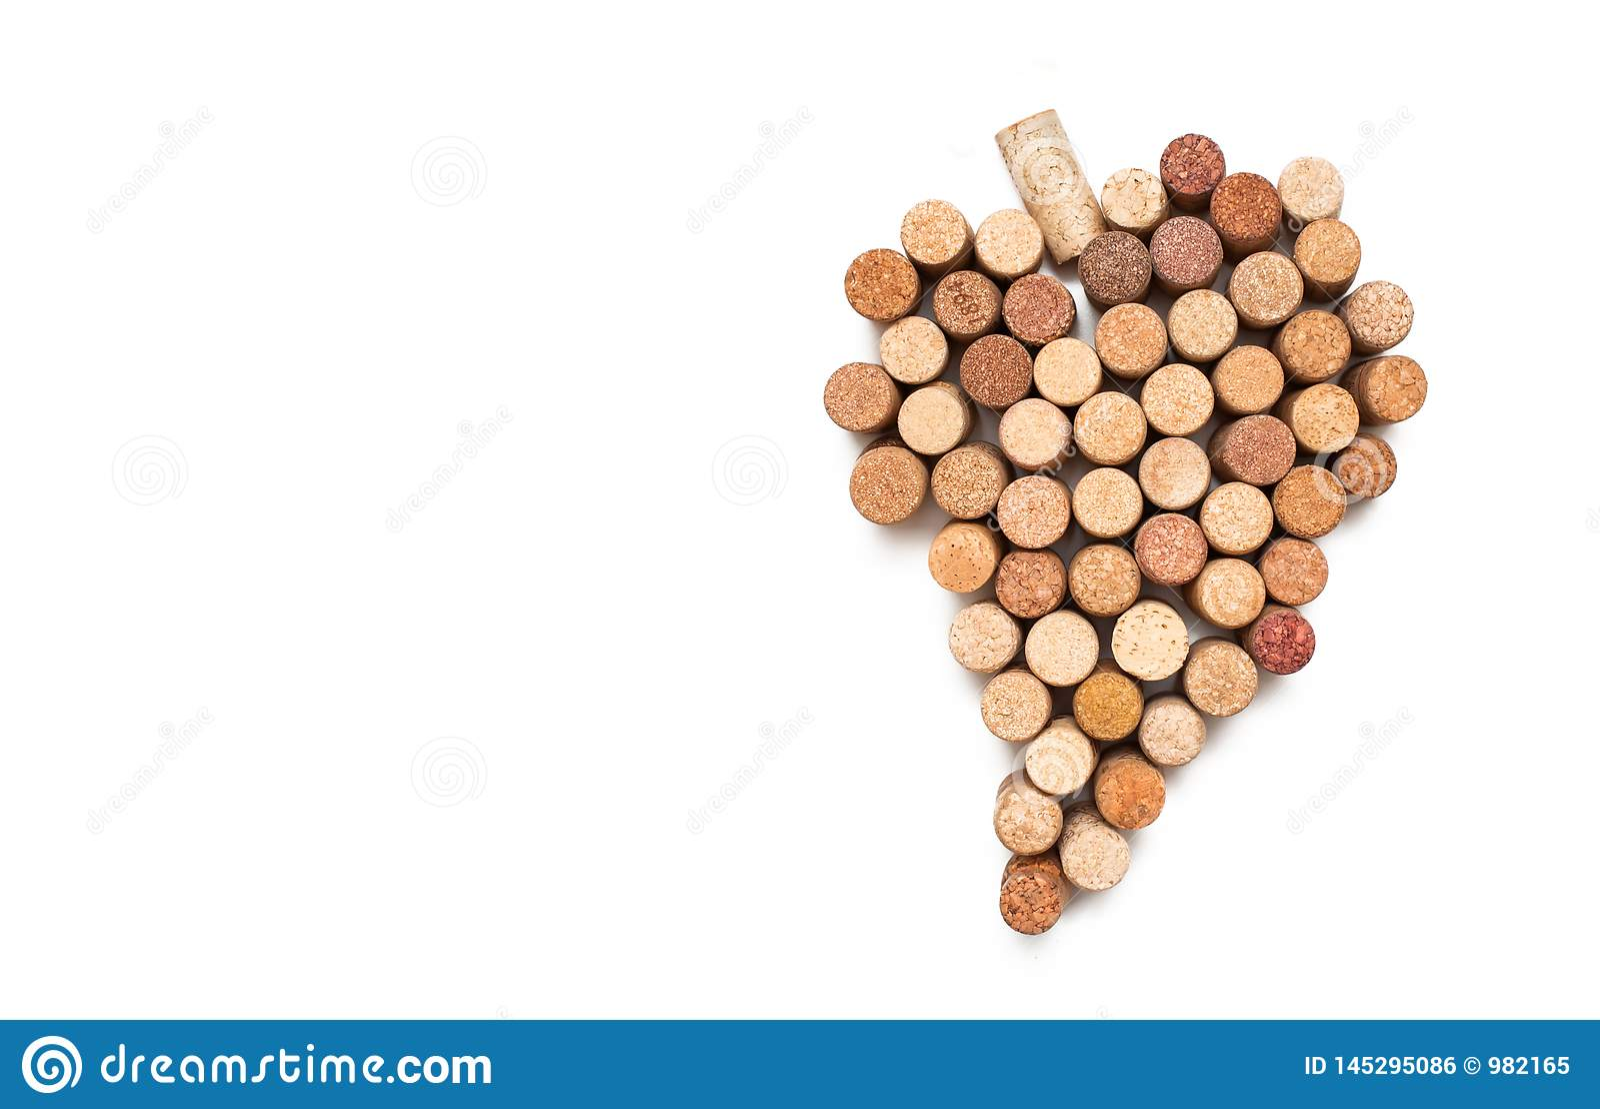 Love for wine. Wine cork heart symbol